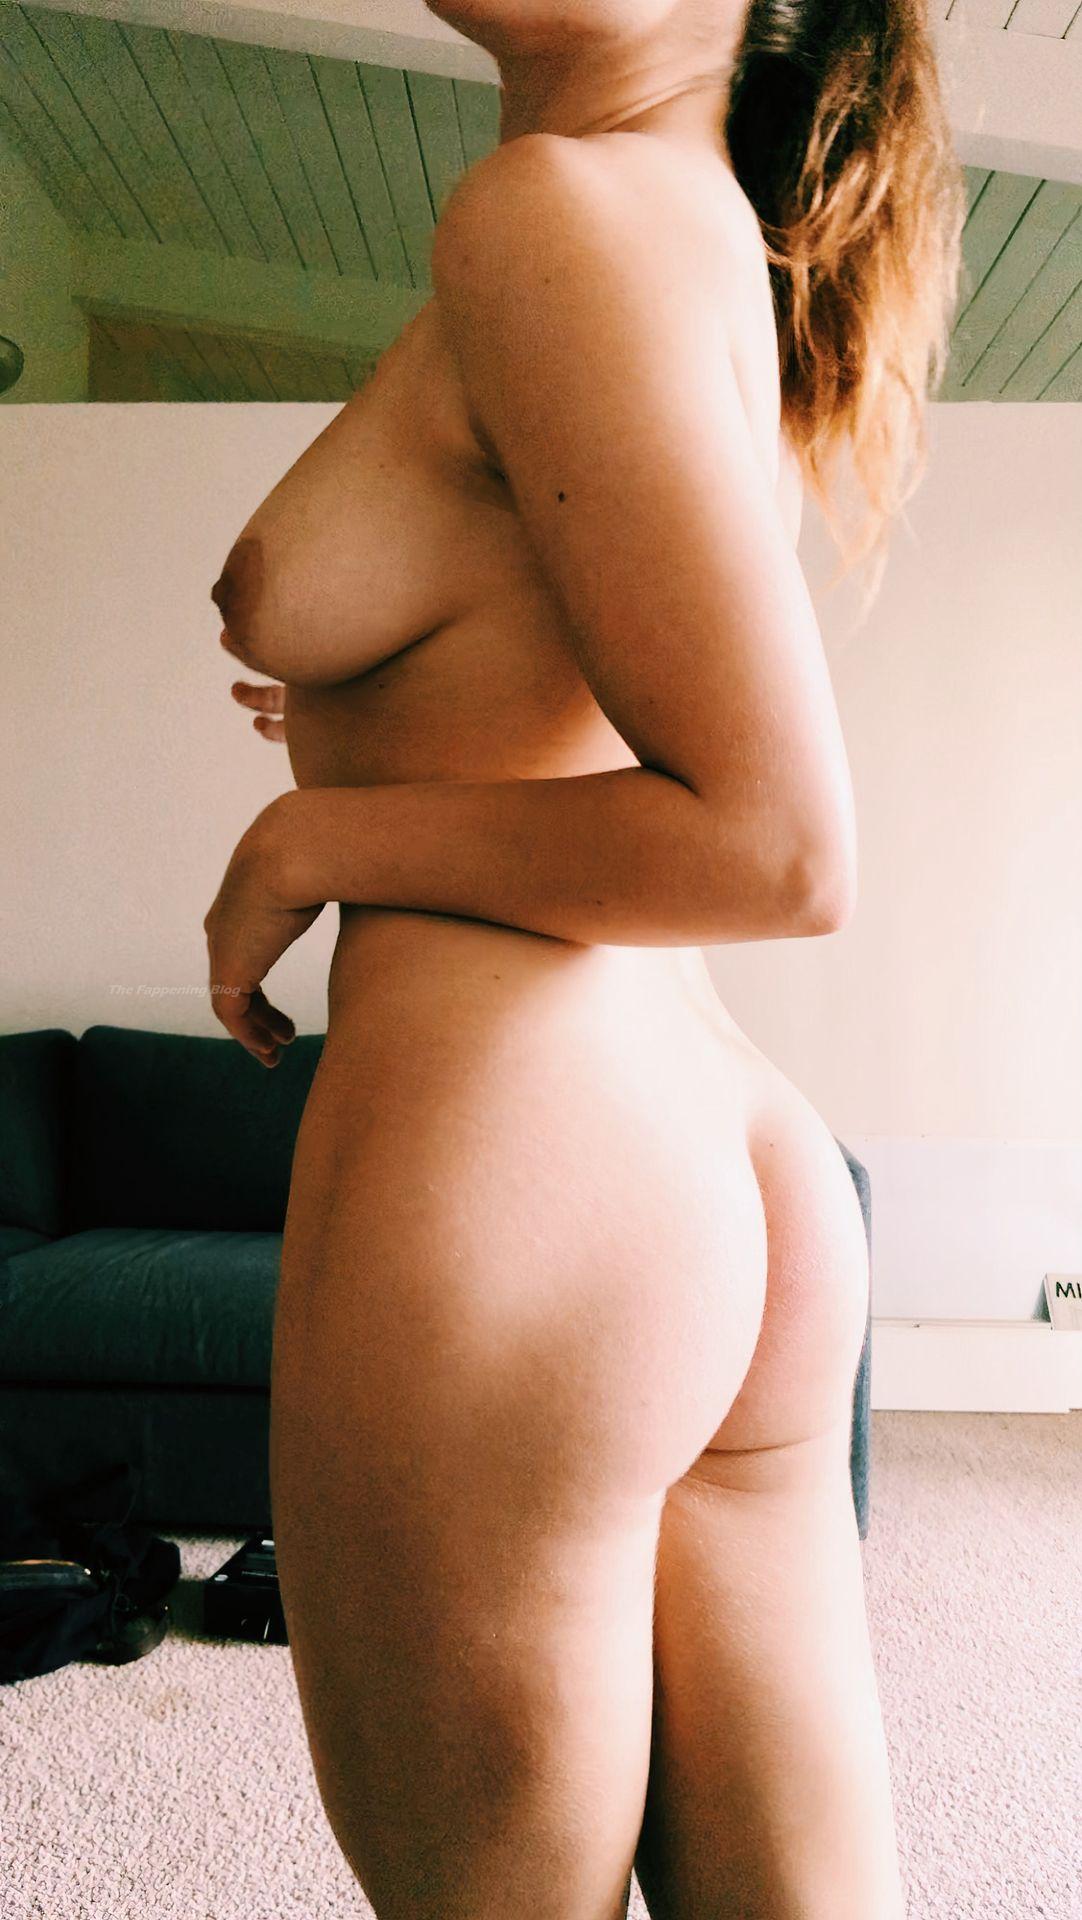 Melina Goransson Nude Leaked 1 Thefappeningblog Com